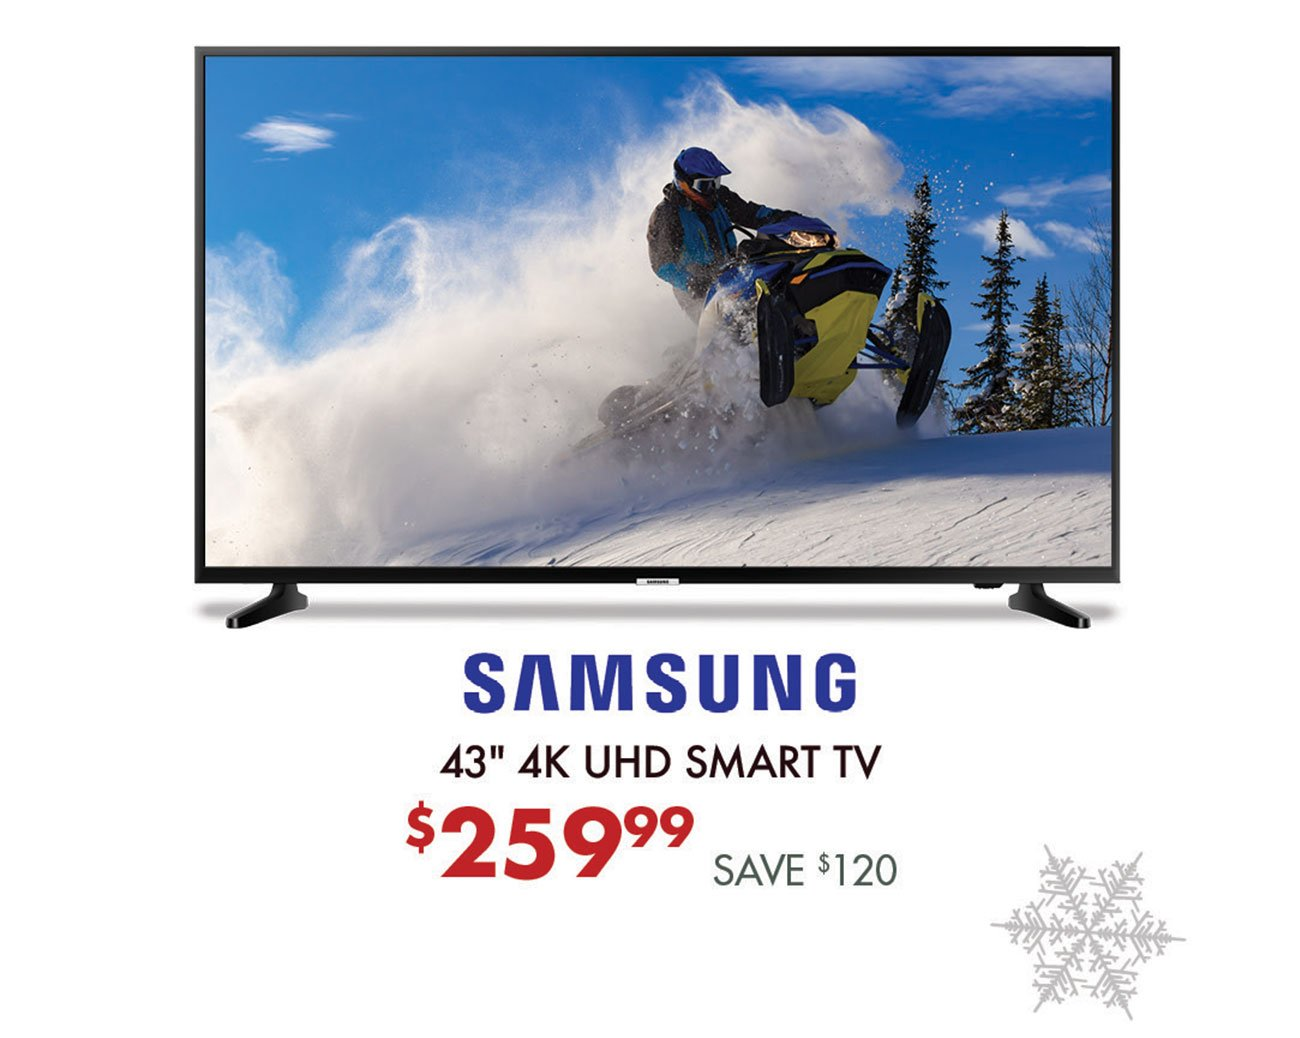 Samsung-43-4K-UHD-Smart-TV-UIRV